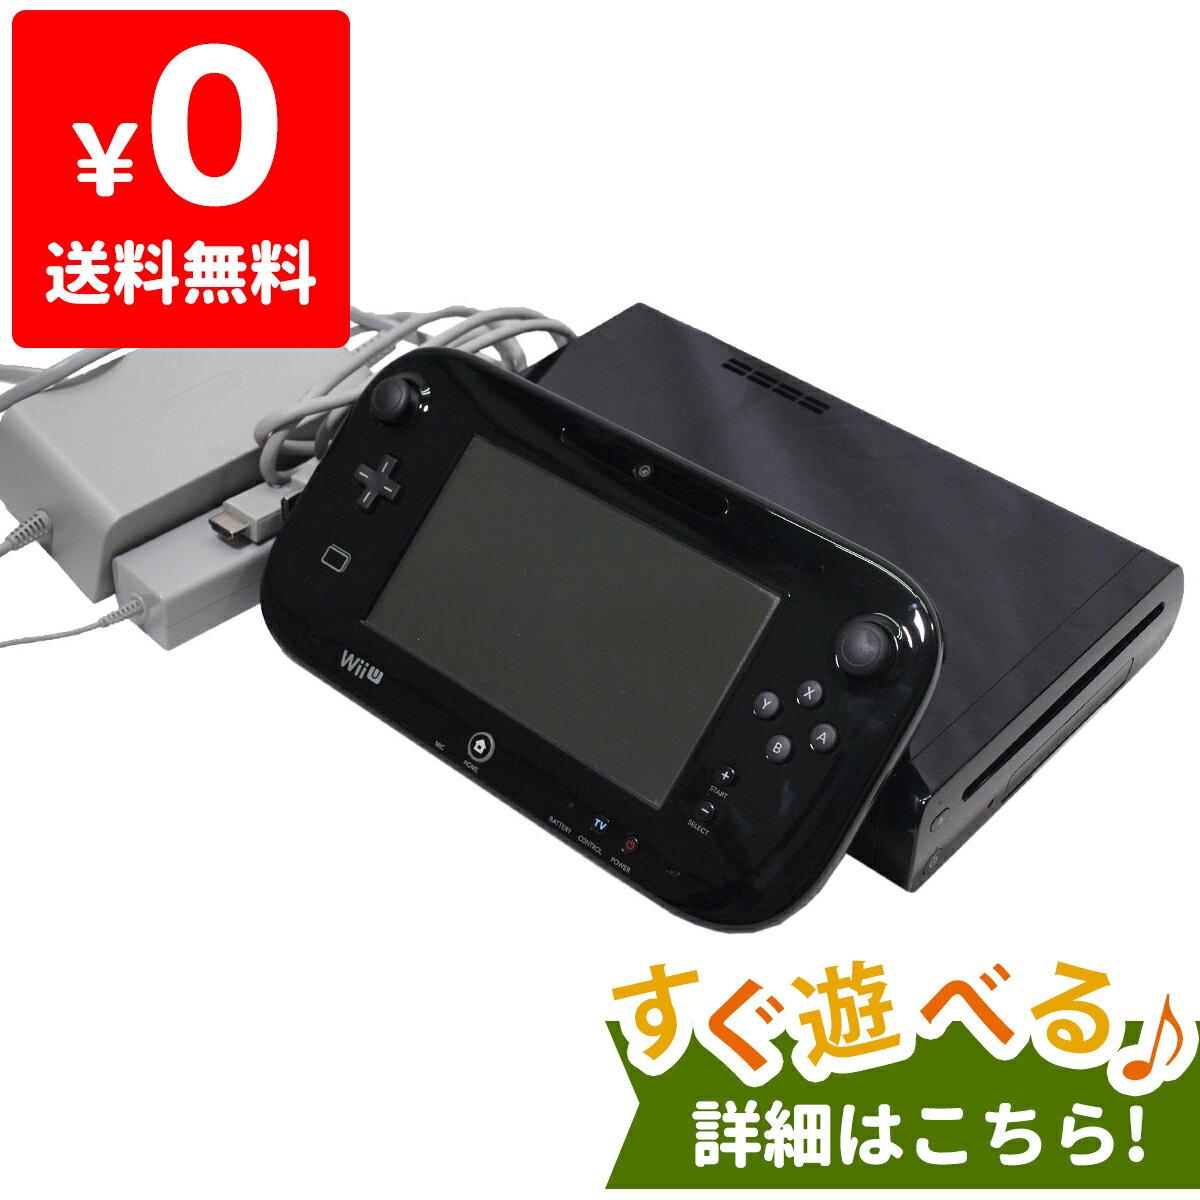 Wii U 本体 プレミアムセット kuro クロ ニンテンドー 任天堂 NINTENDO ゲーム機 中古 すぐ遊べるセット 4902370519884 送料無料